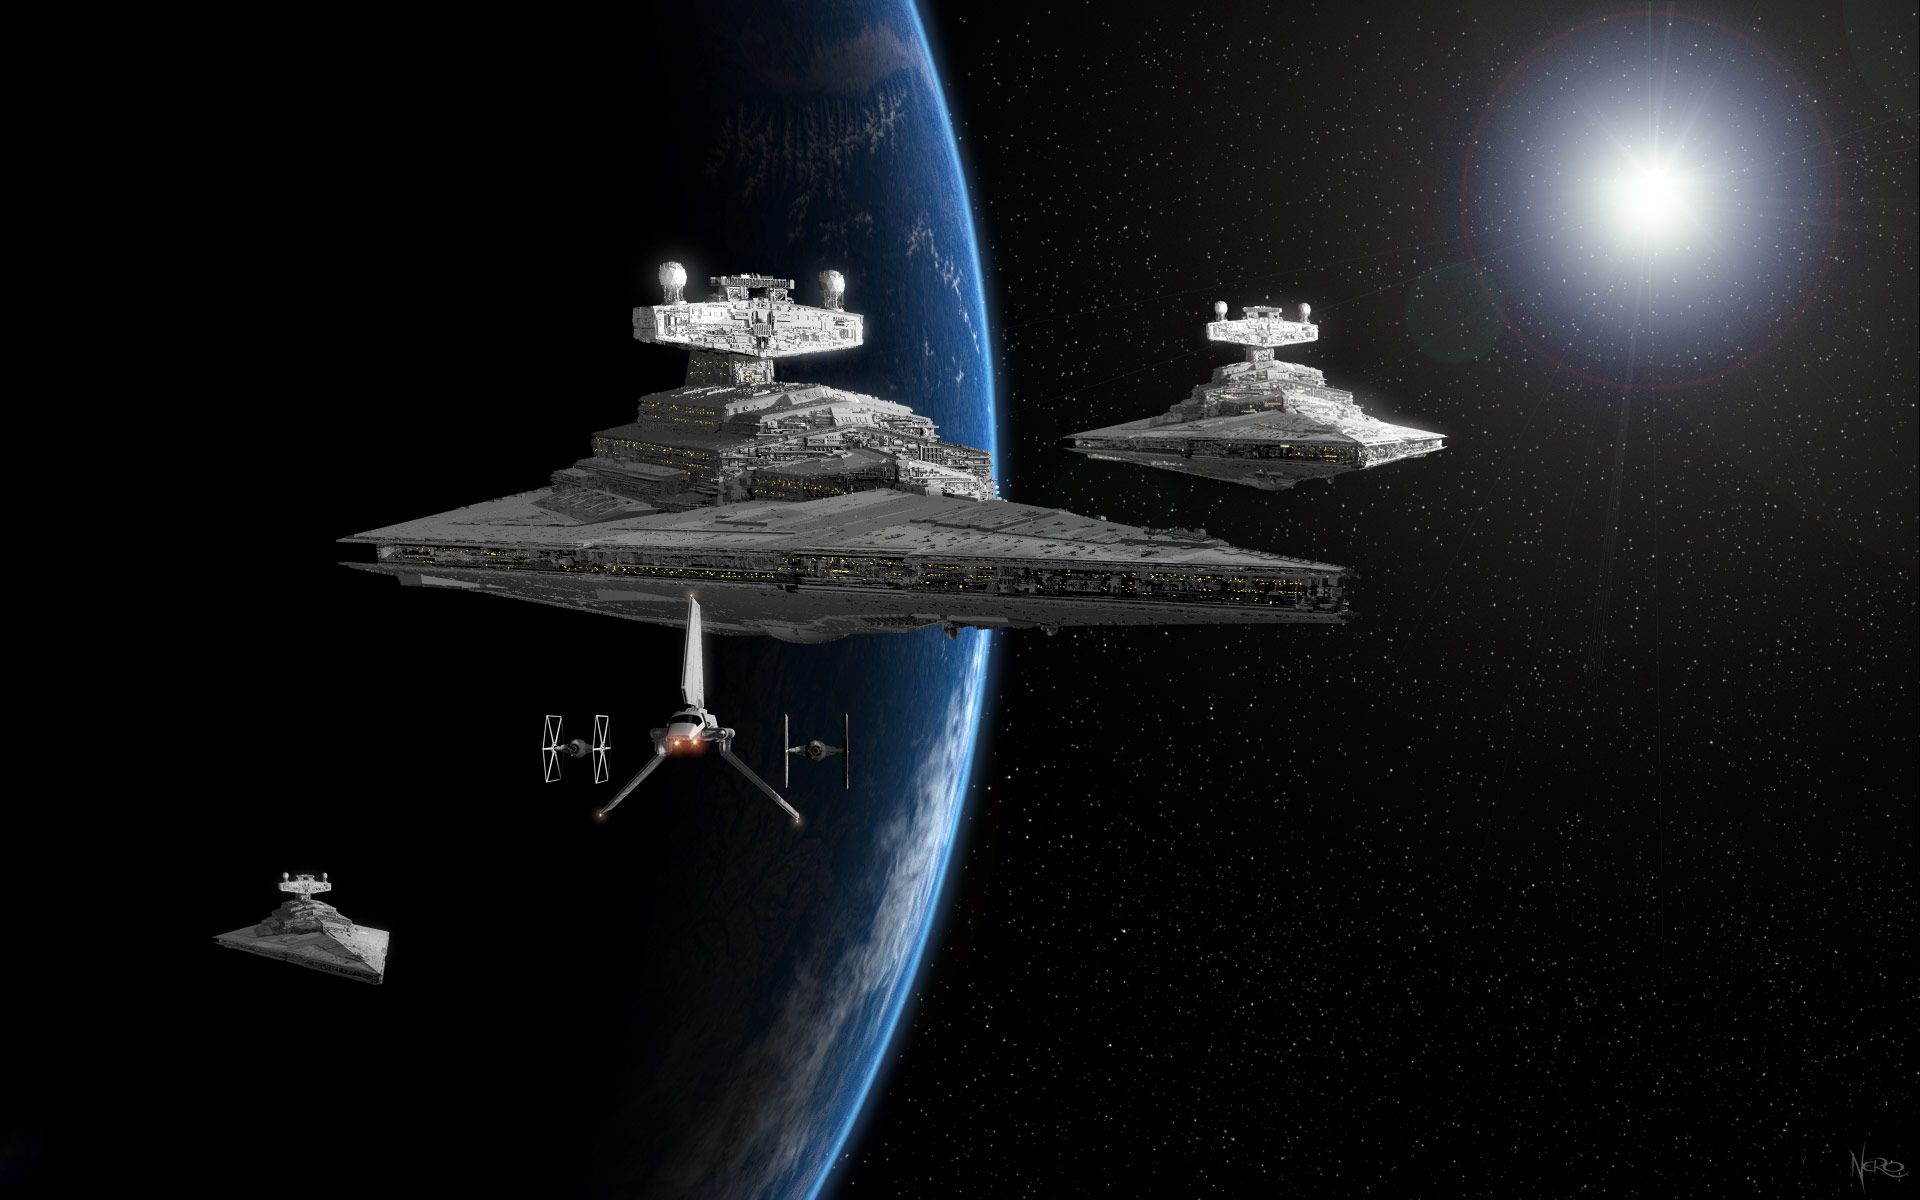 Star Wars Star Destroyer ³ンセプトアート ¹ターウォーズ ¢ート